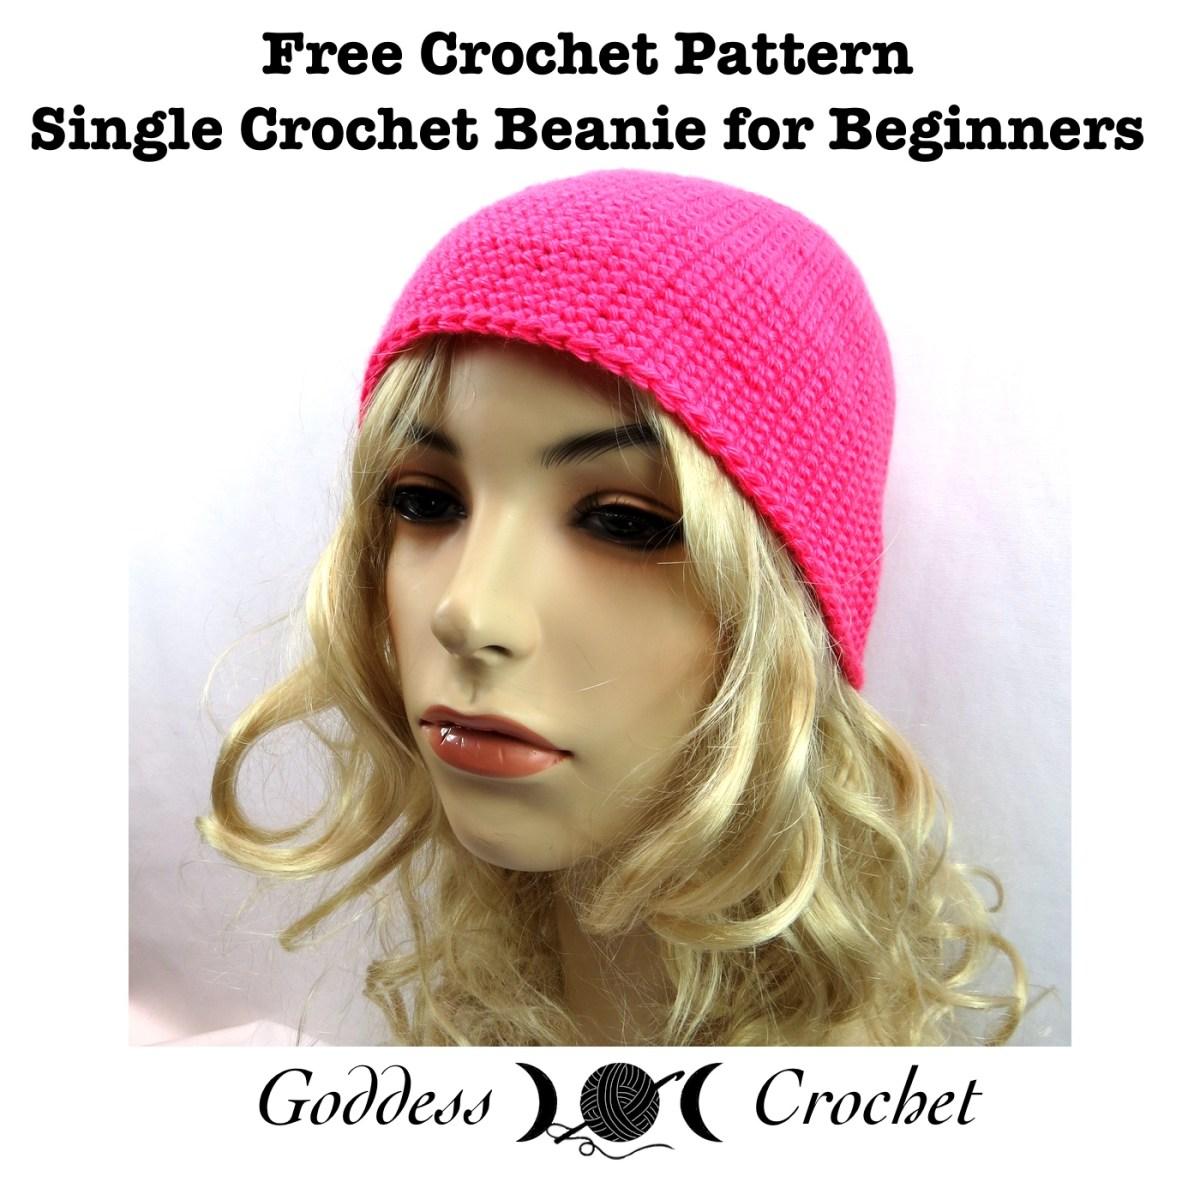 Single Crochet Beanie for Beginners – Free Crochet Pattern with ...